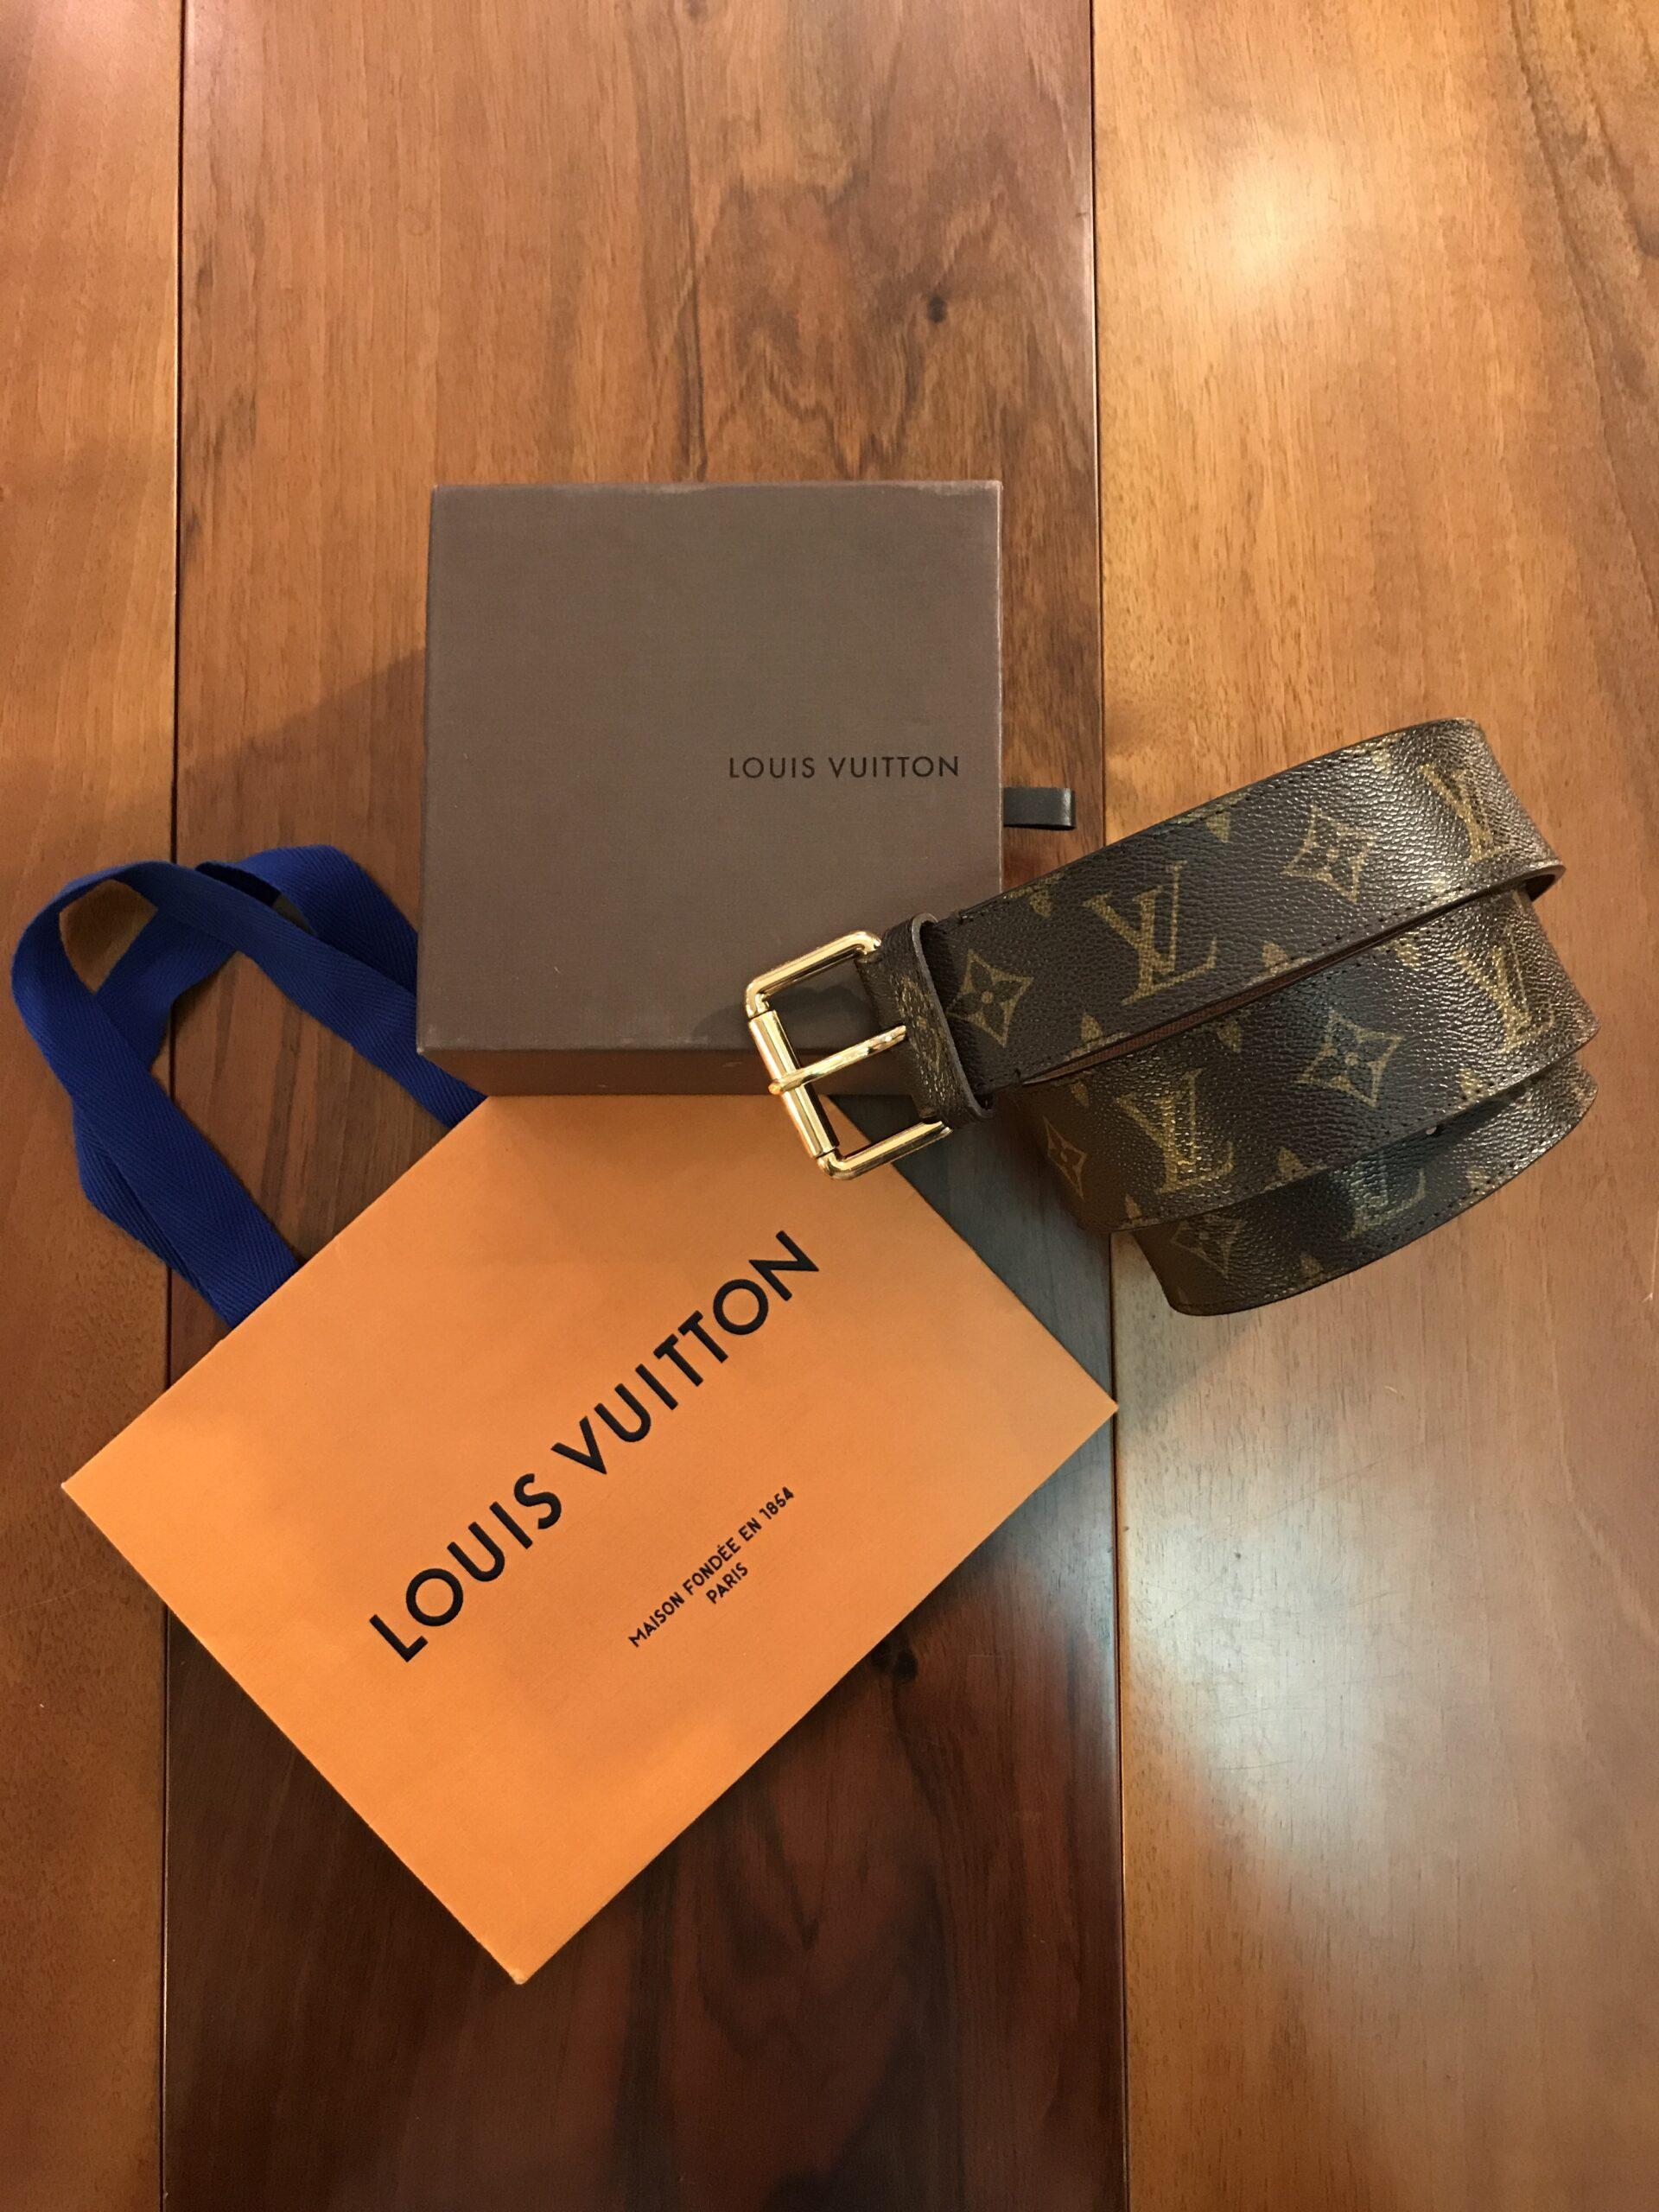 Louis vuitton Cintura Monogram